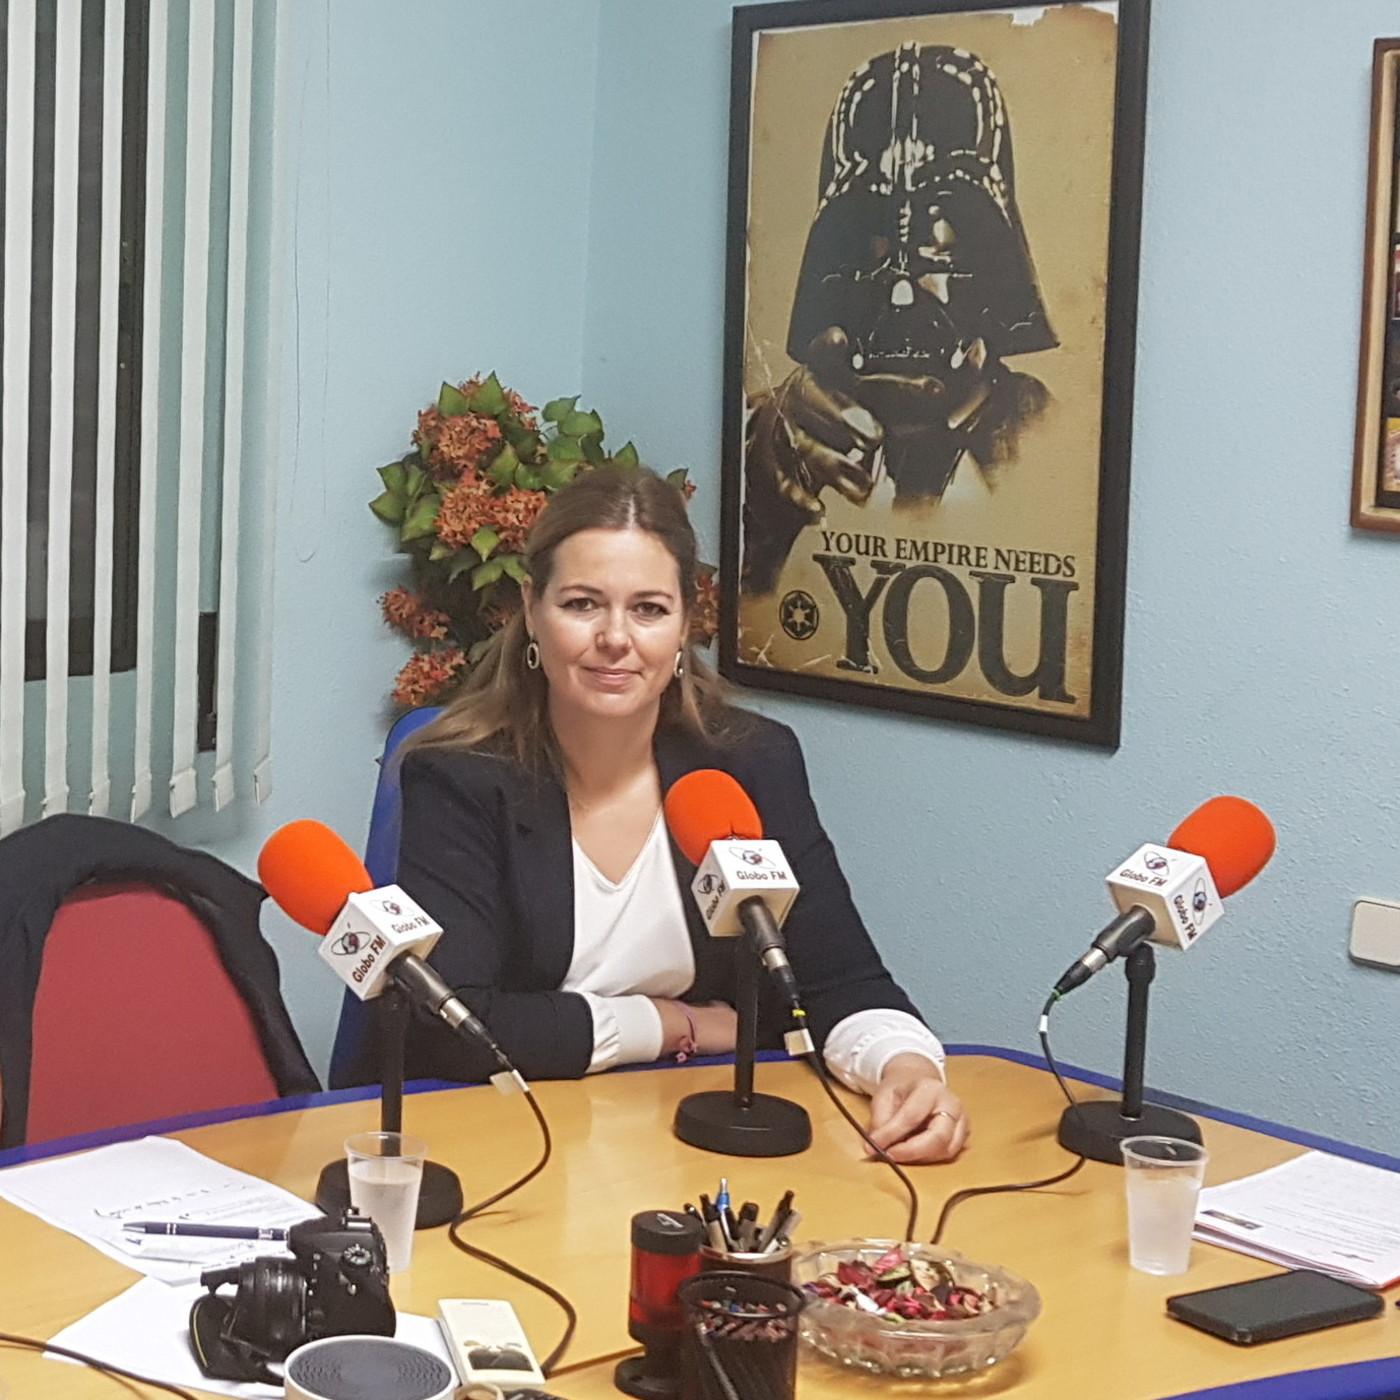 Crónicas. Con Azahara Molina, alcaldesa de Torrejón de la Calzada. Martes 12 mayo.